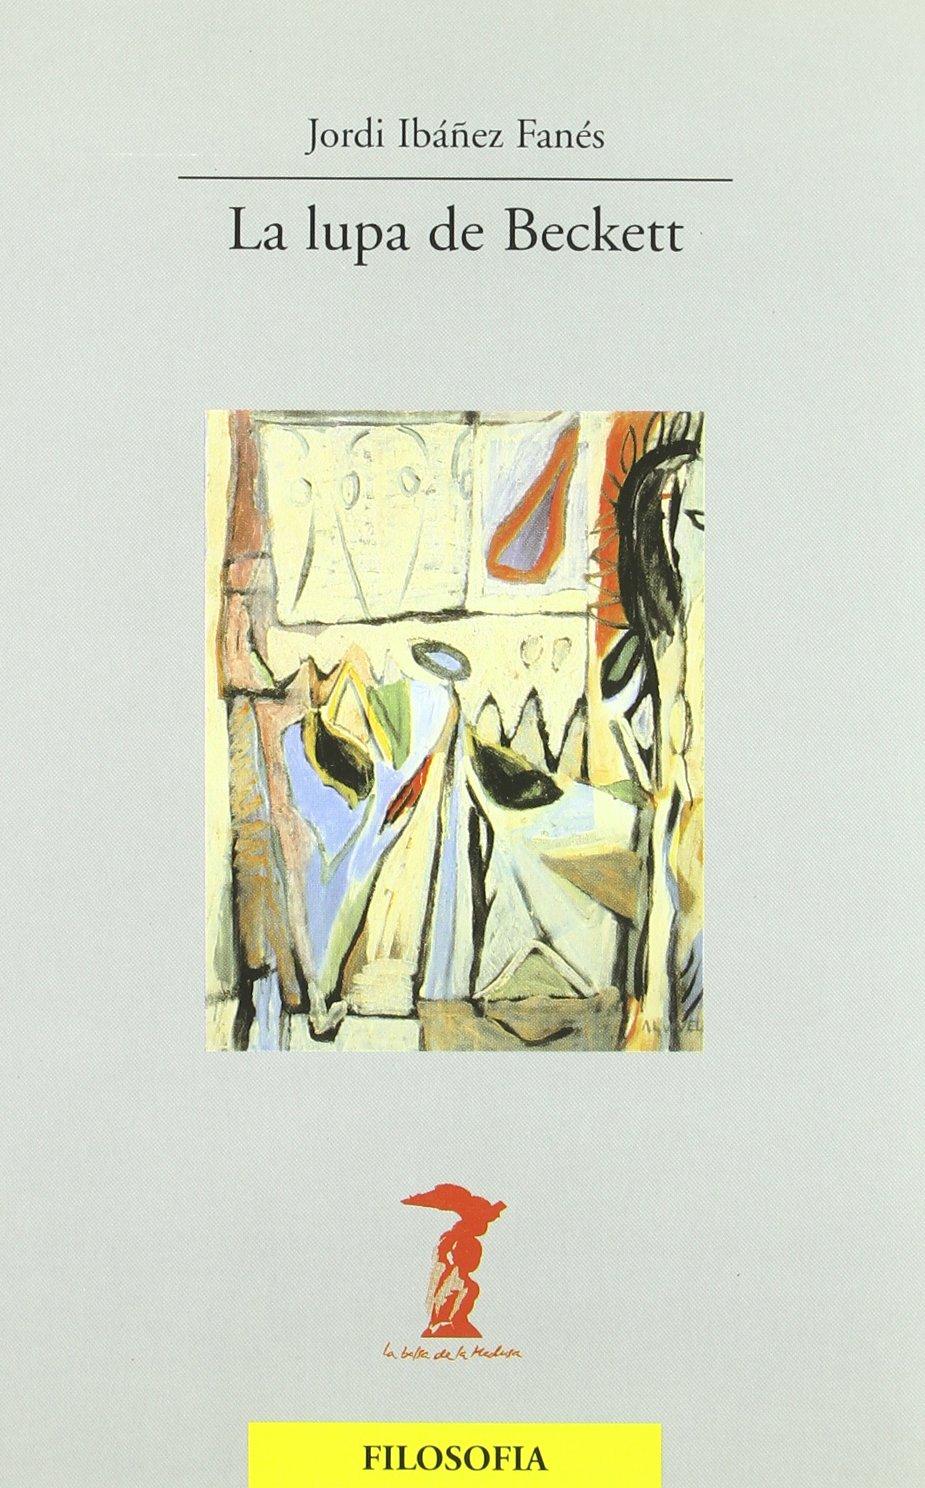 La Lupa de Beckett (Spanish Edition): Jordi Ibanez Fanes: 9788477746409: Amazon.com: Books